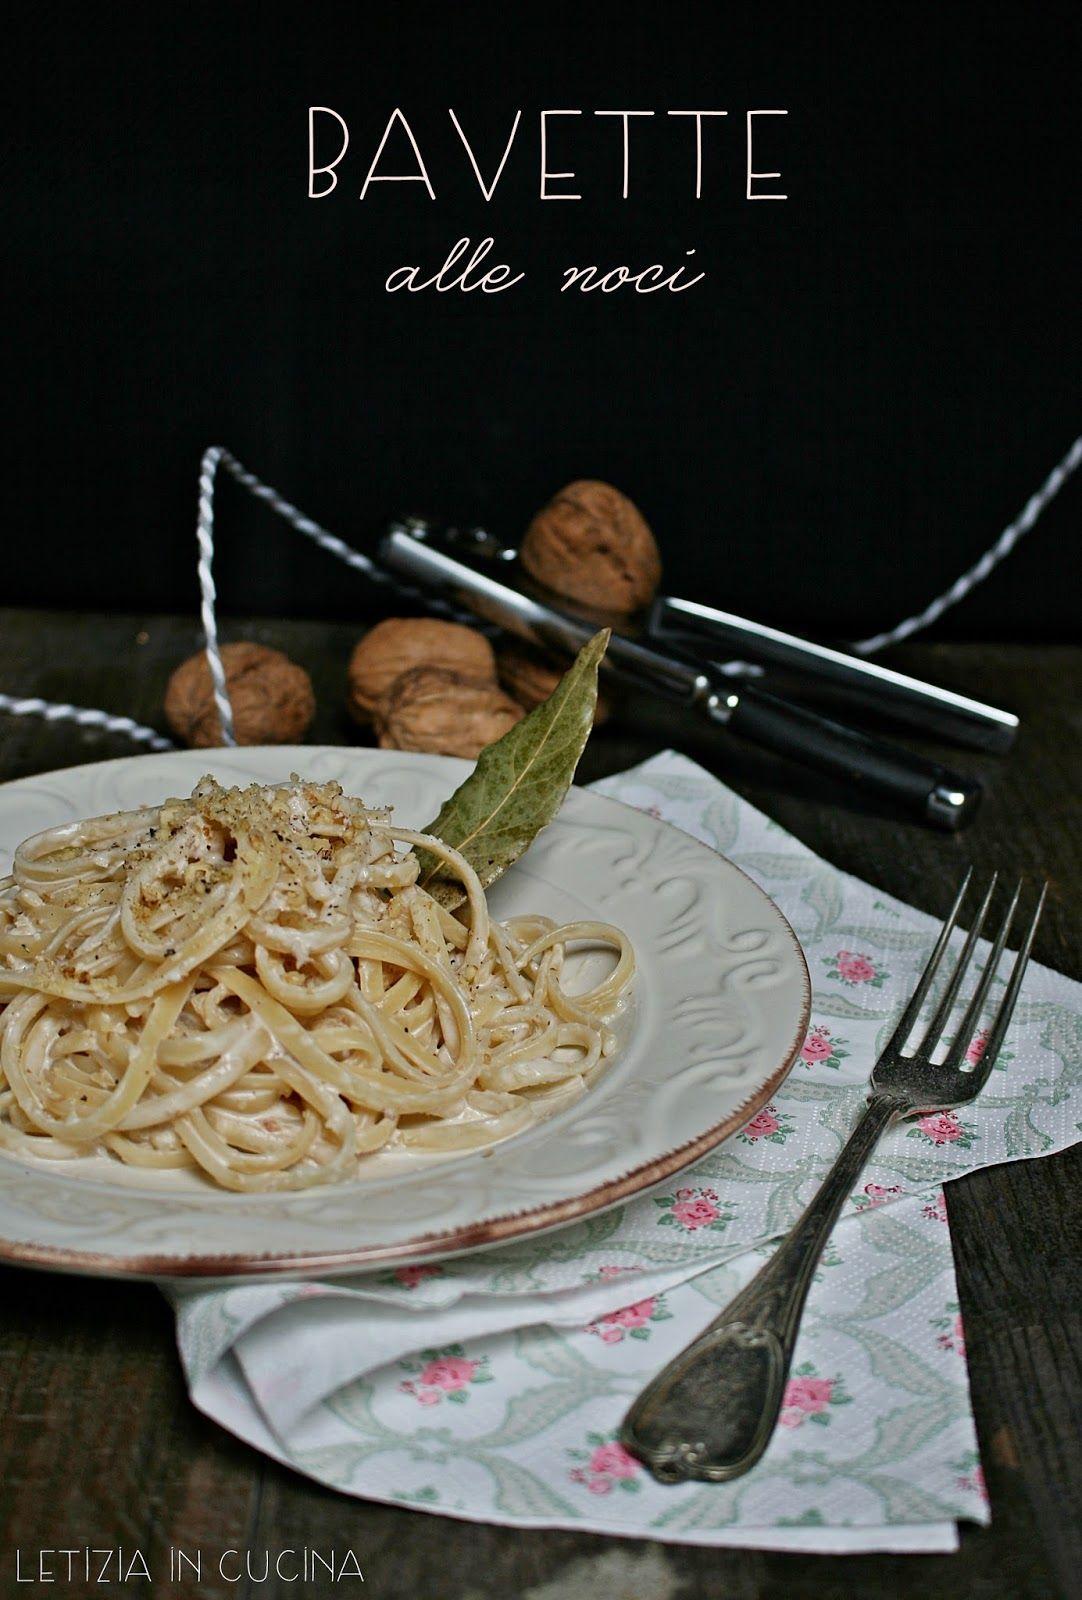 Letizia in Cucina: Bavette alle noci   Primi piatti   Bavette ...